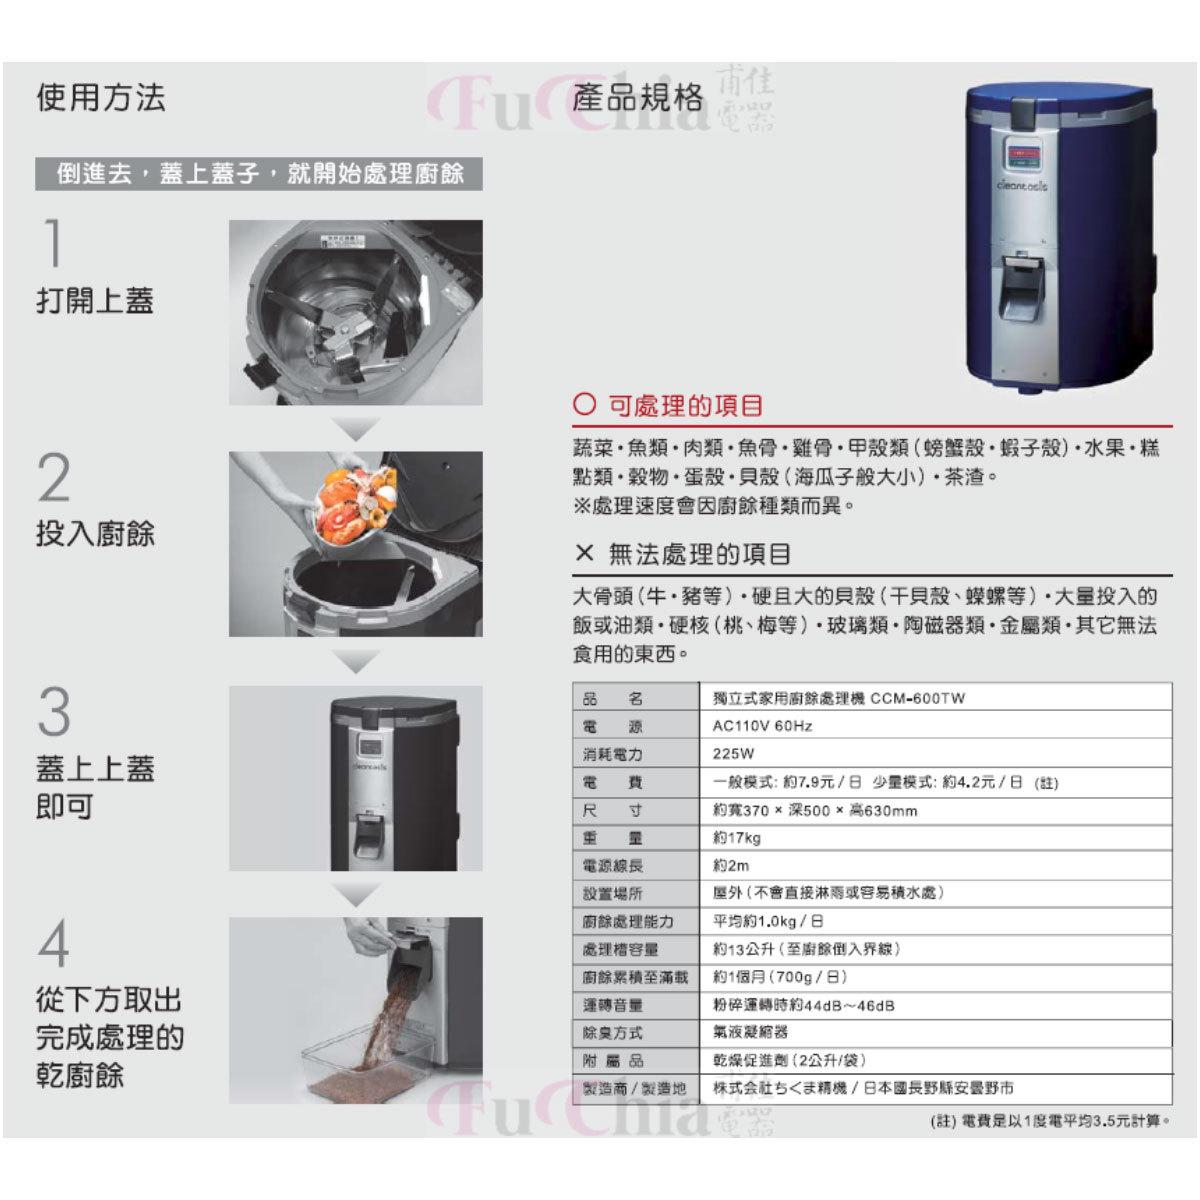 Chikuma CCM600TW 粉碎+乾燥式 獨立式廚餘處理機 室內/外型兩用